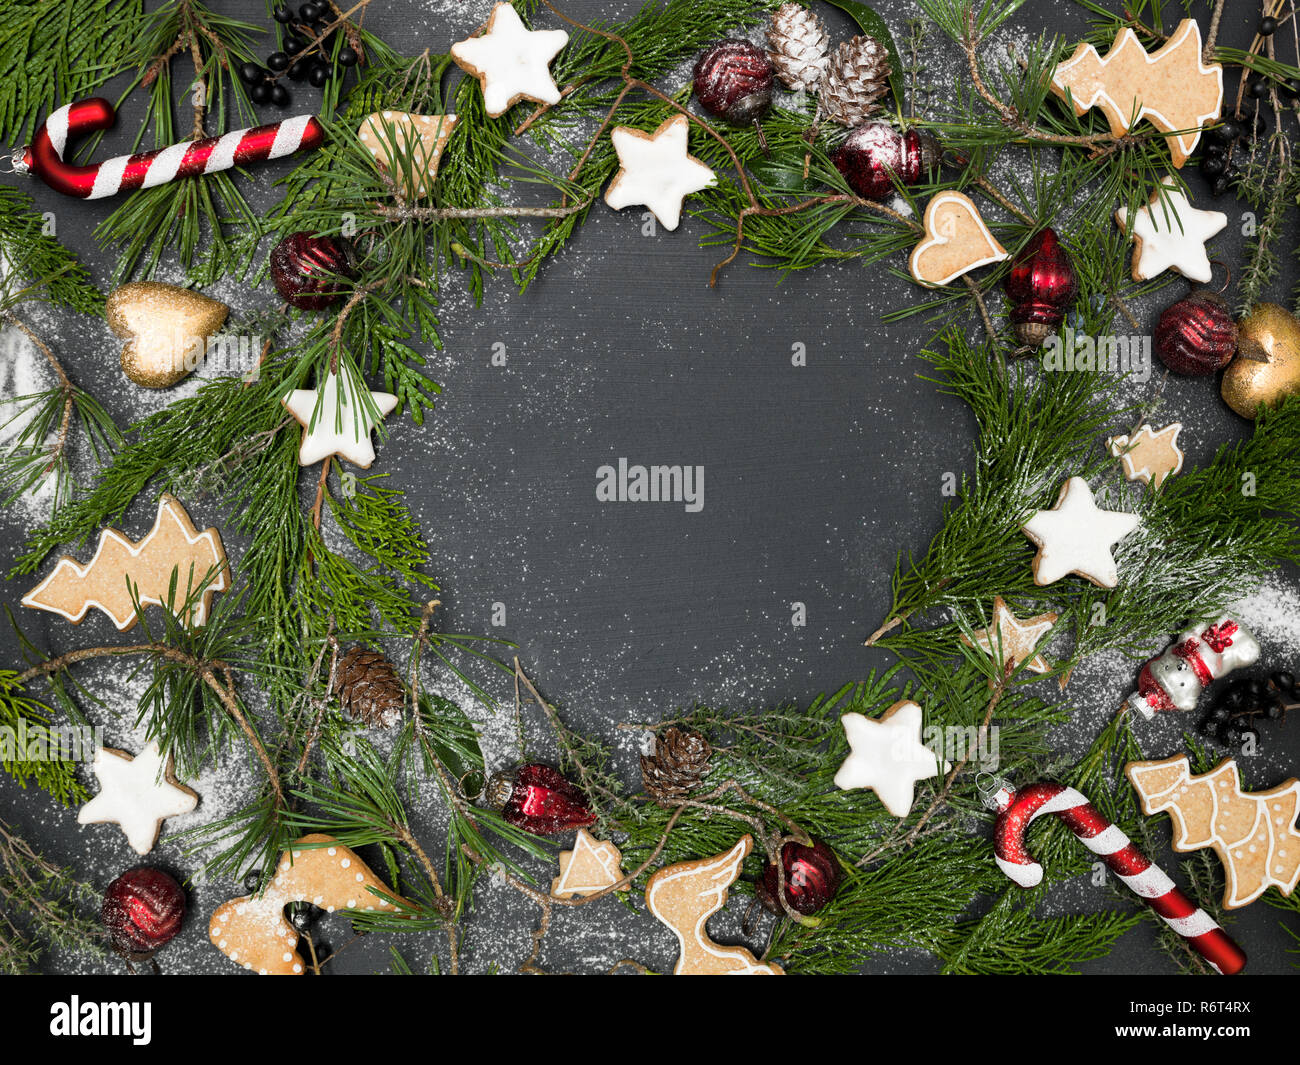 Christmas Items.Christmas Wreath With Christmas Items On Black Chalkboard